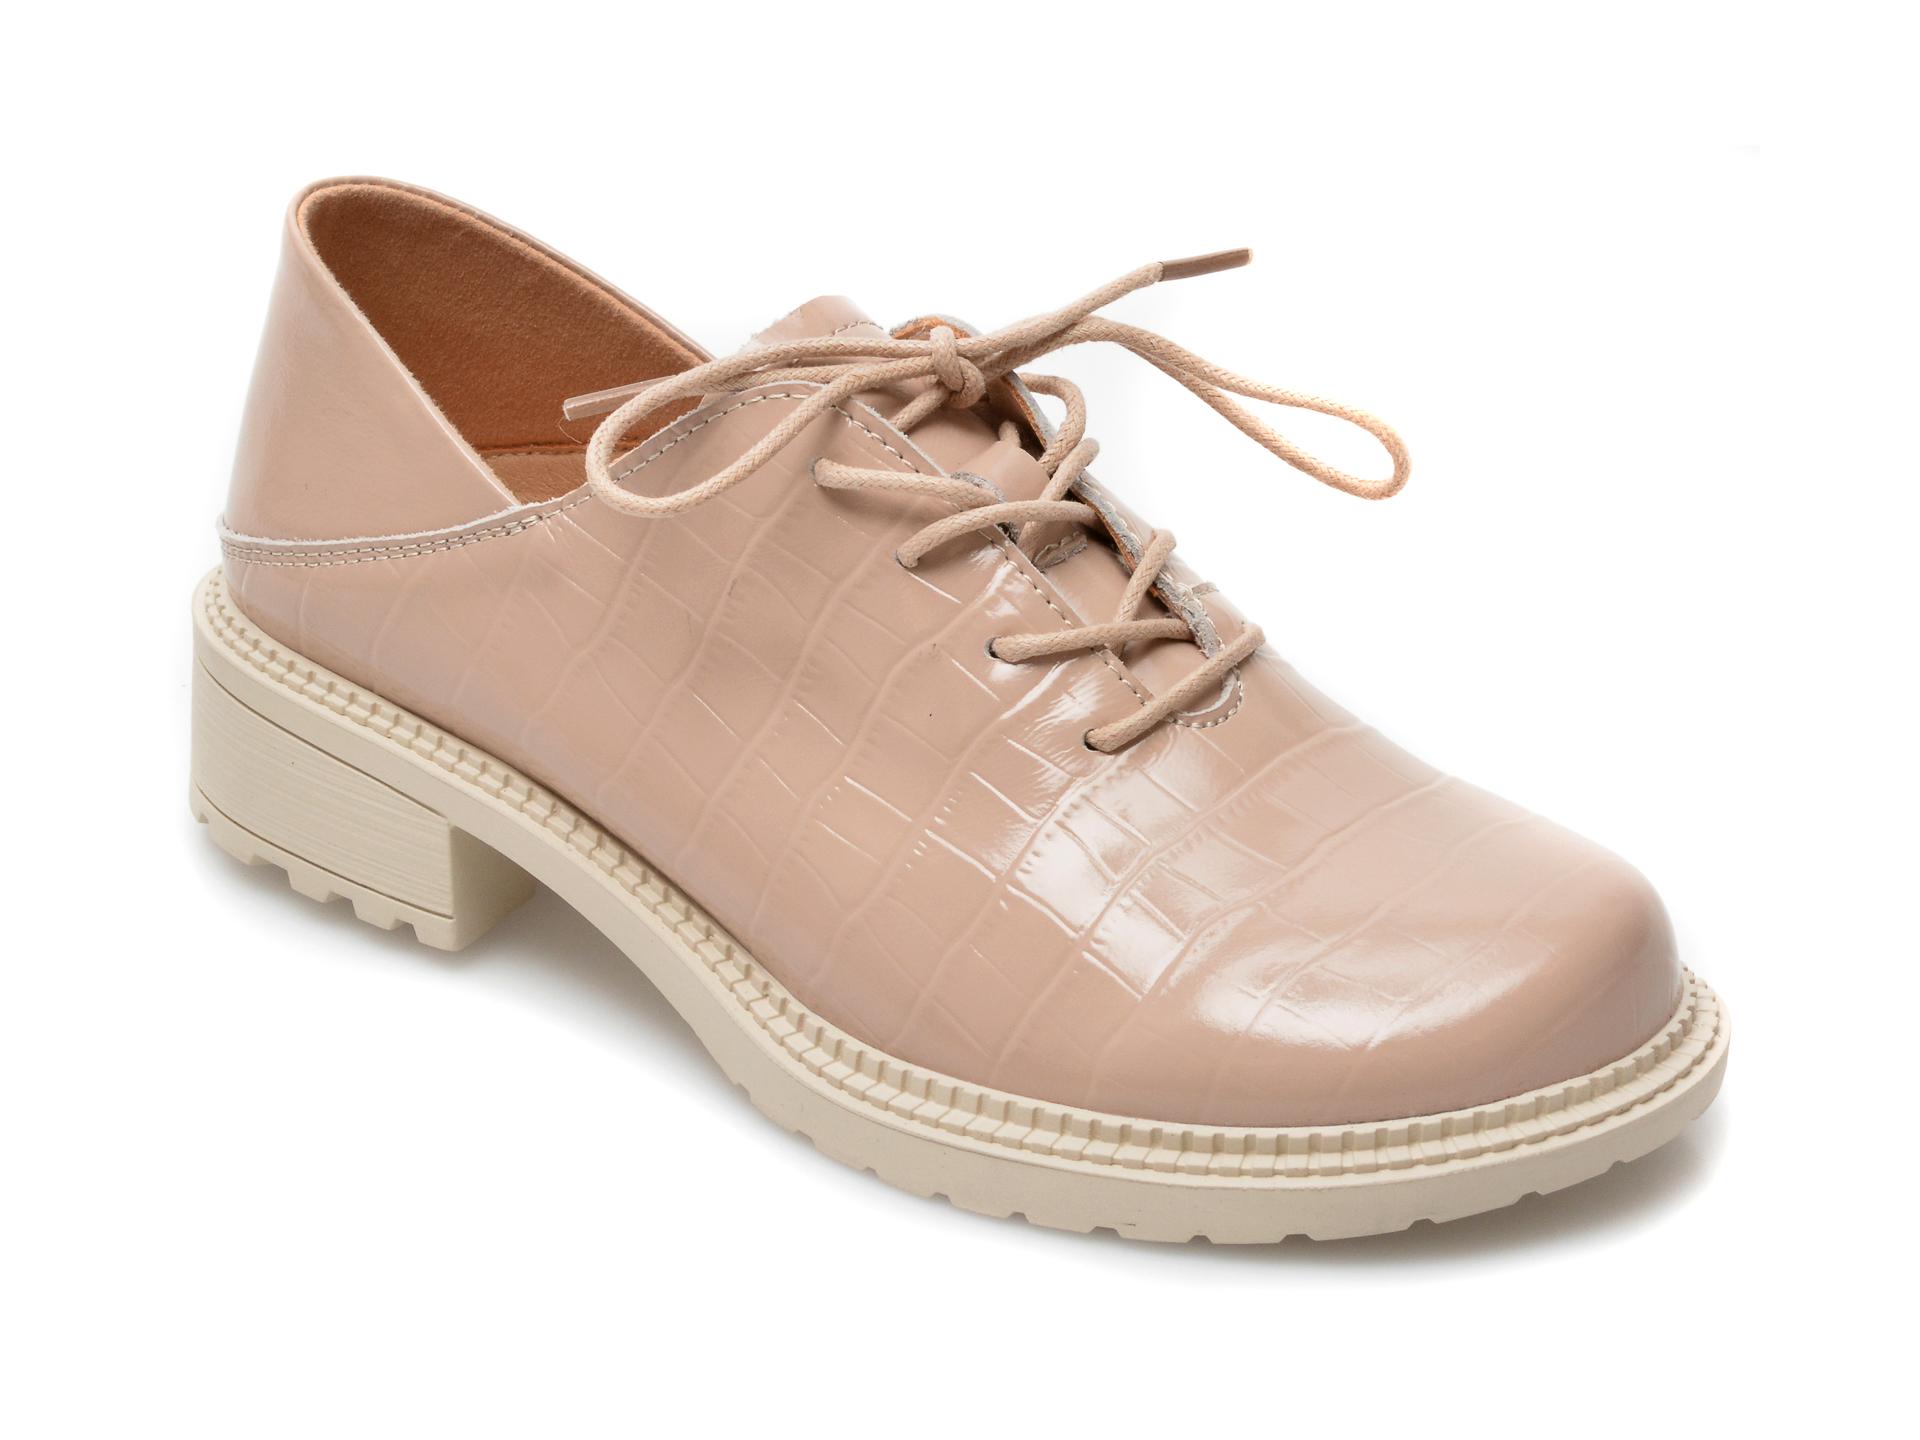 Pantofi GRYXX nude, Z018, din piele naturala lacuita imagine otter.ro 2021